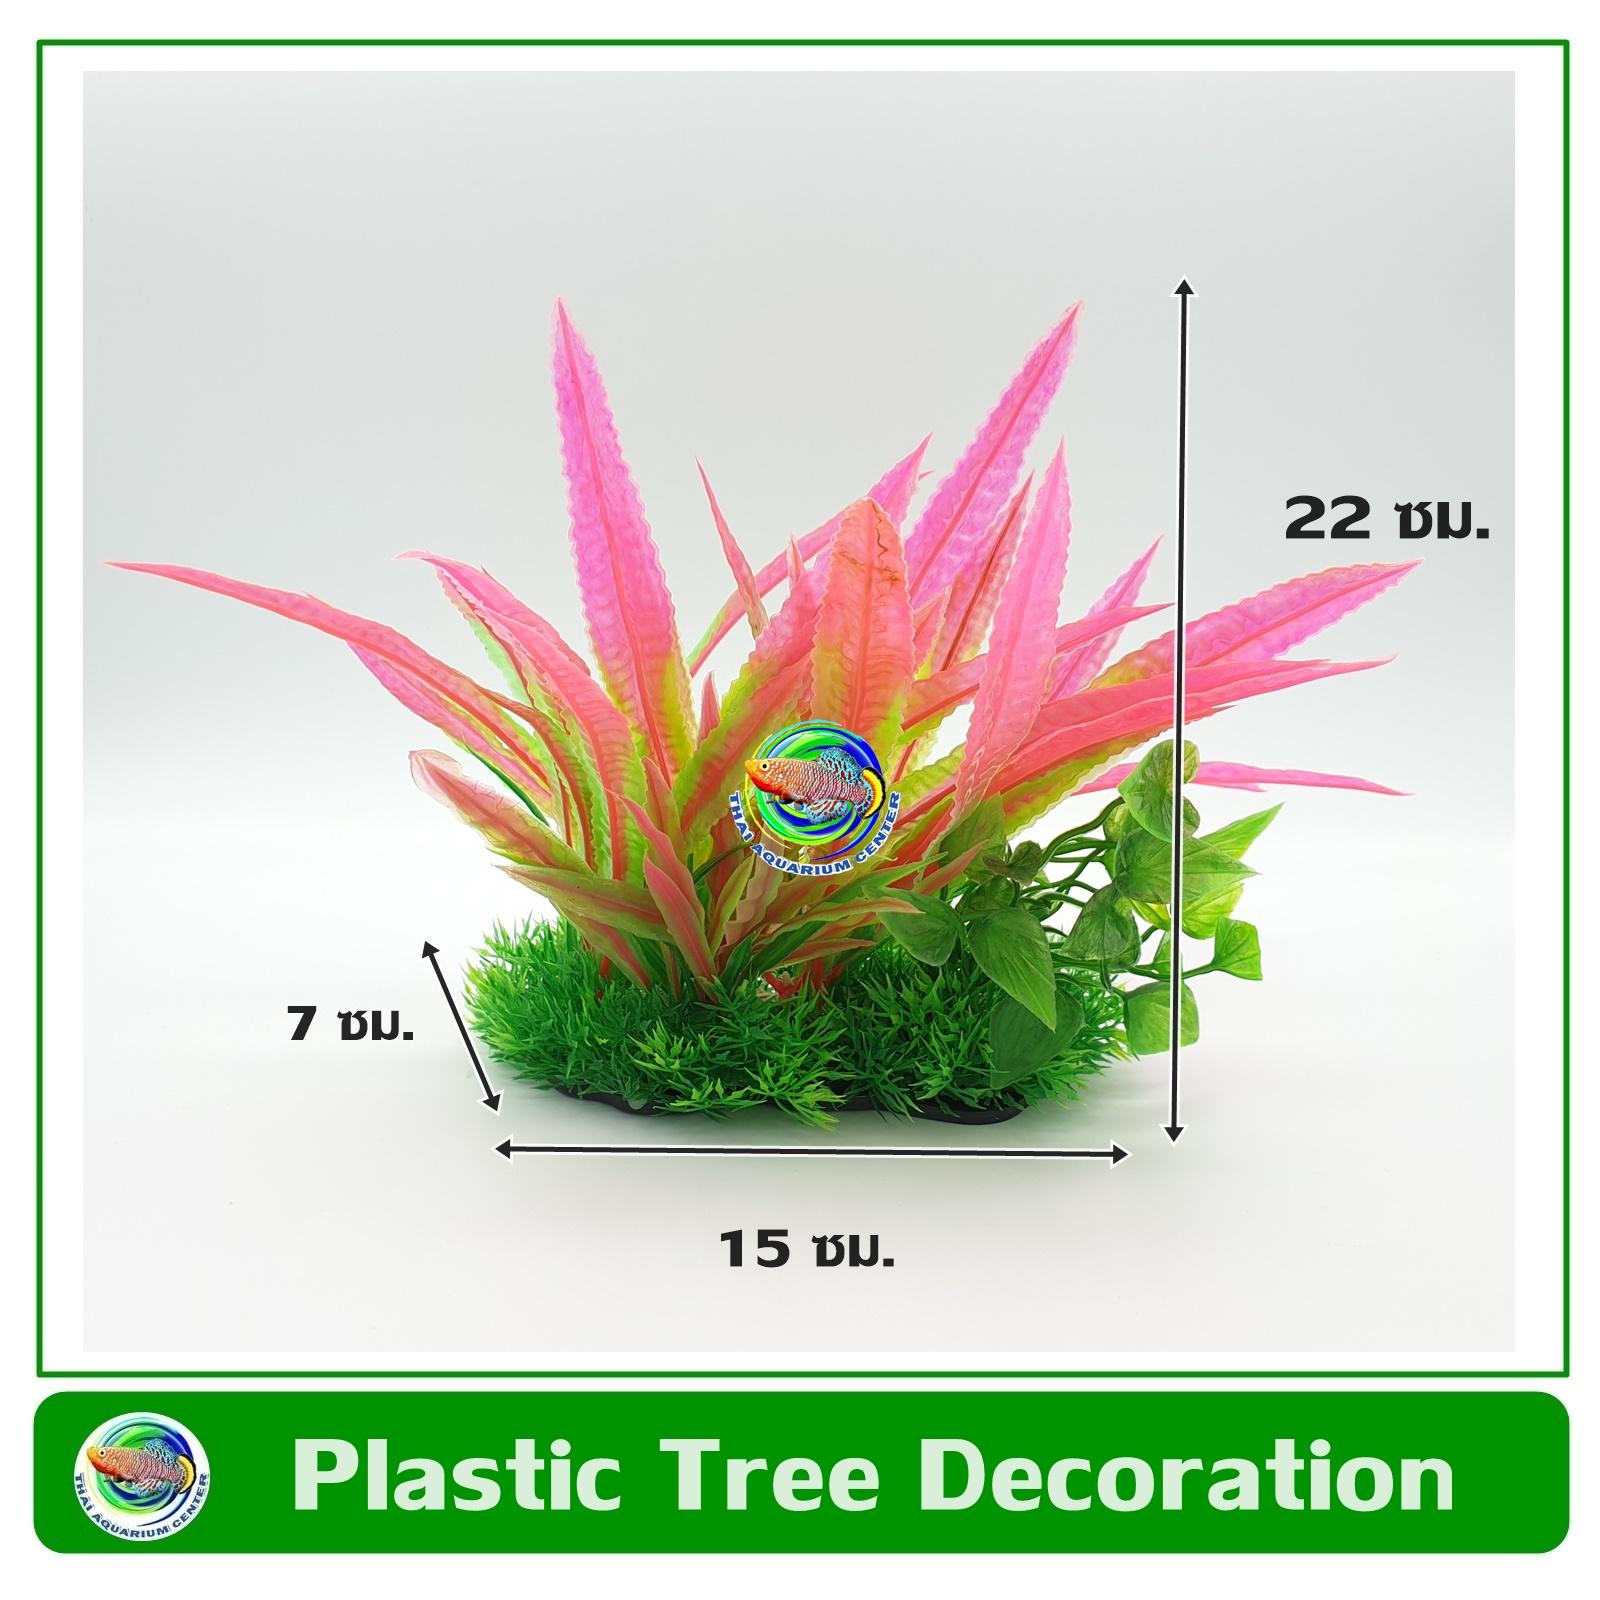 T047 ต้นไม้พลาสติก ใบสีชมพู ใบเรียวยาว ต้นใหญ่ ใช้ตกแต่งตู้ปลา Pink Leaf Tree